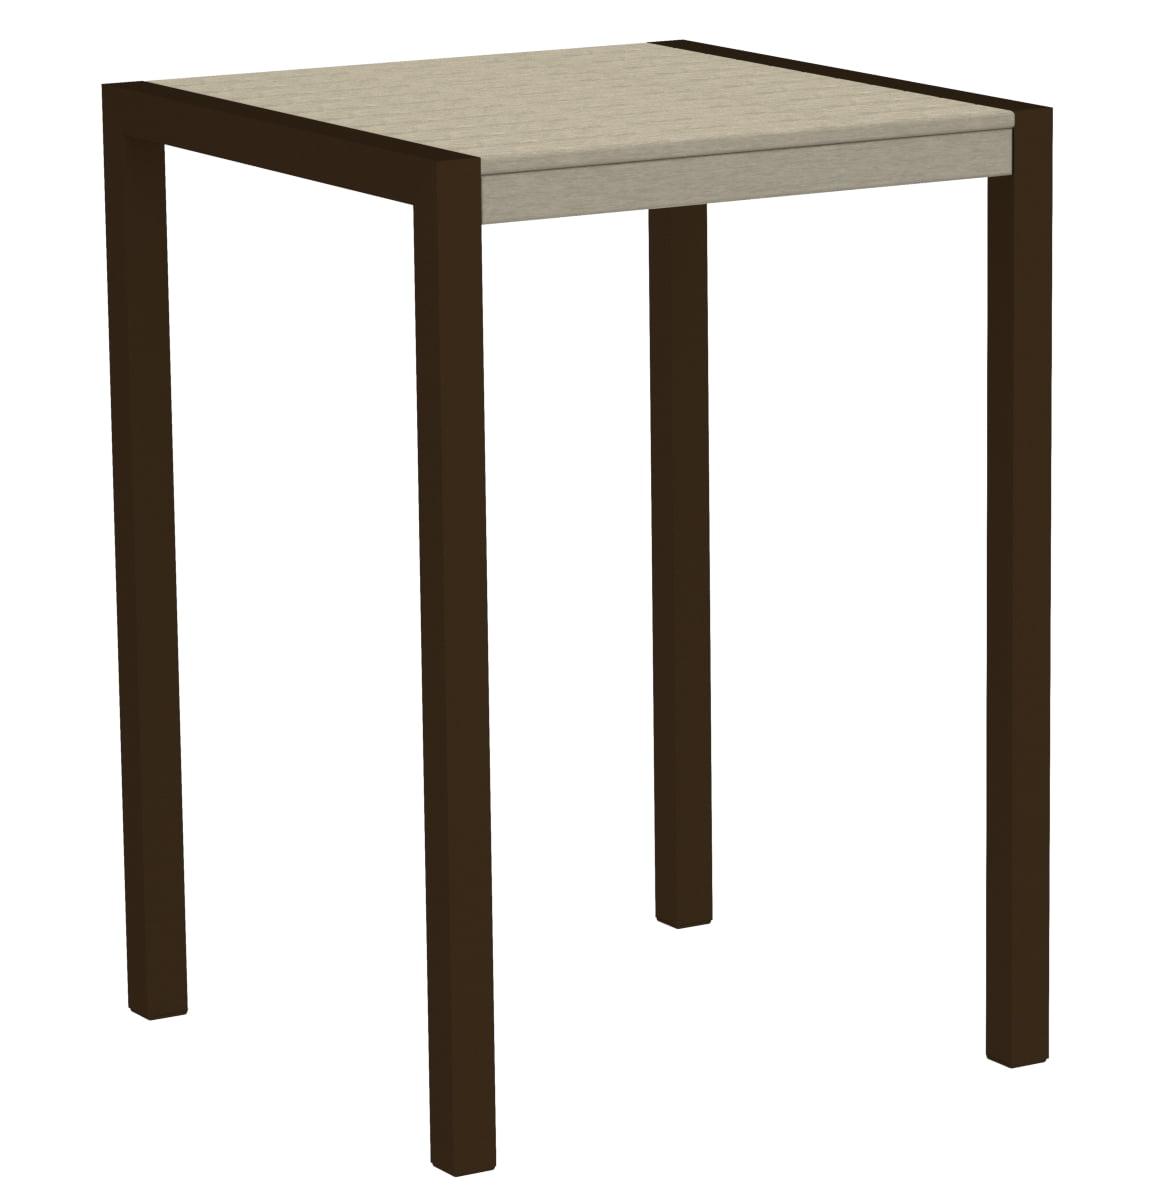 POLYWOOD 8002-16SA MOD 30' Bar Table in Textured Bronze / Sand